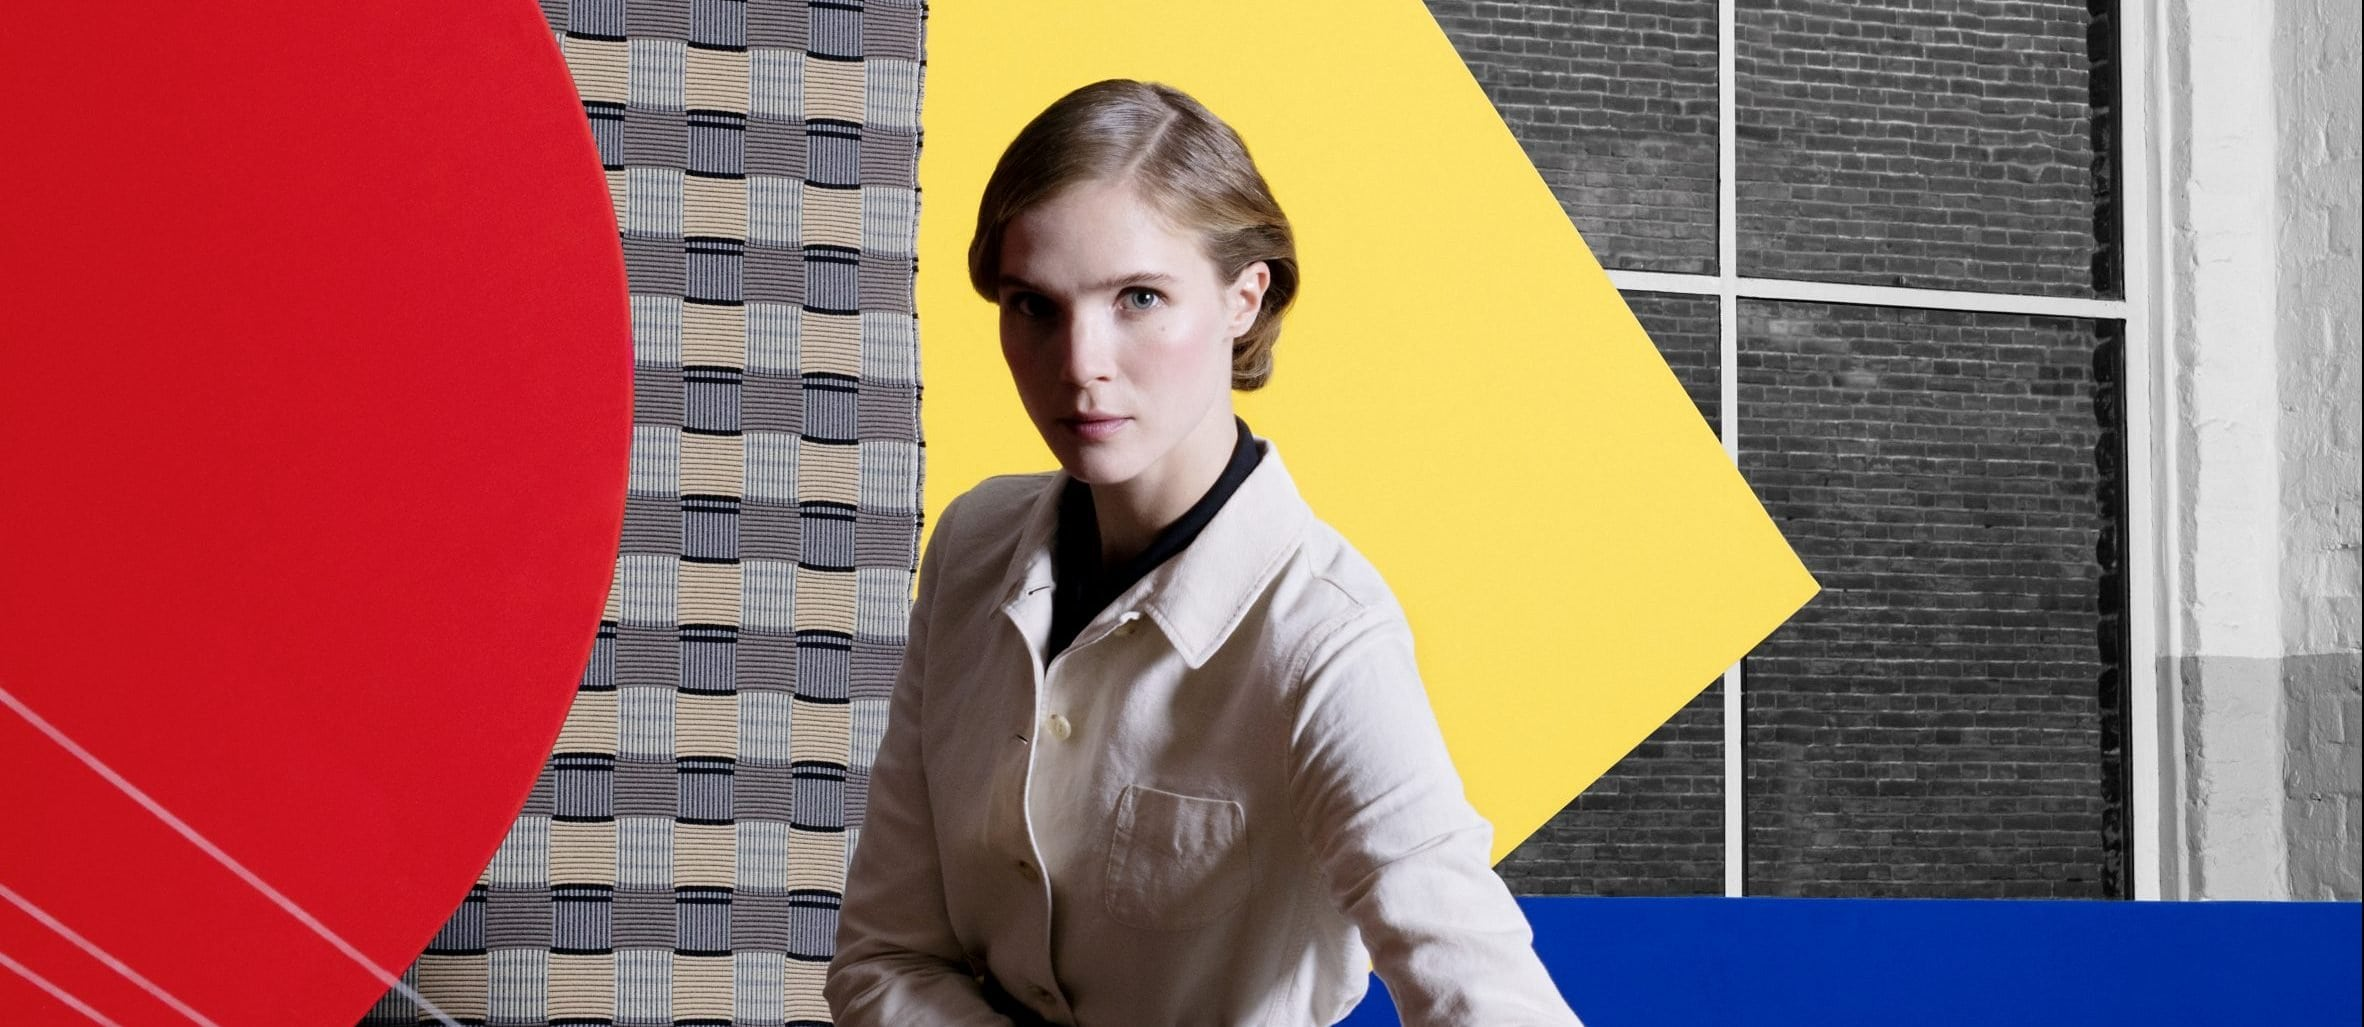 Campaign image Bauhaus